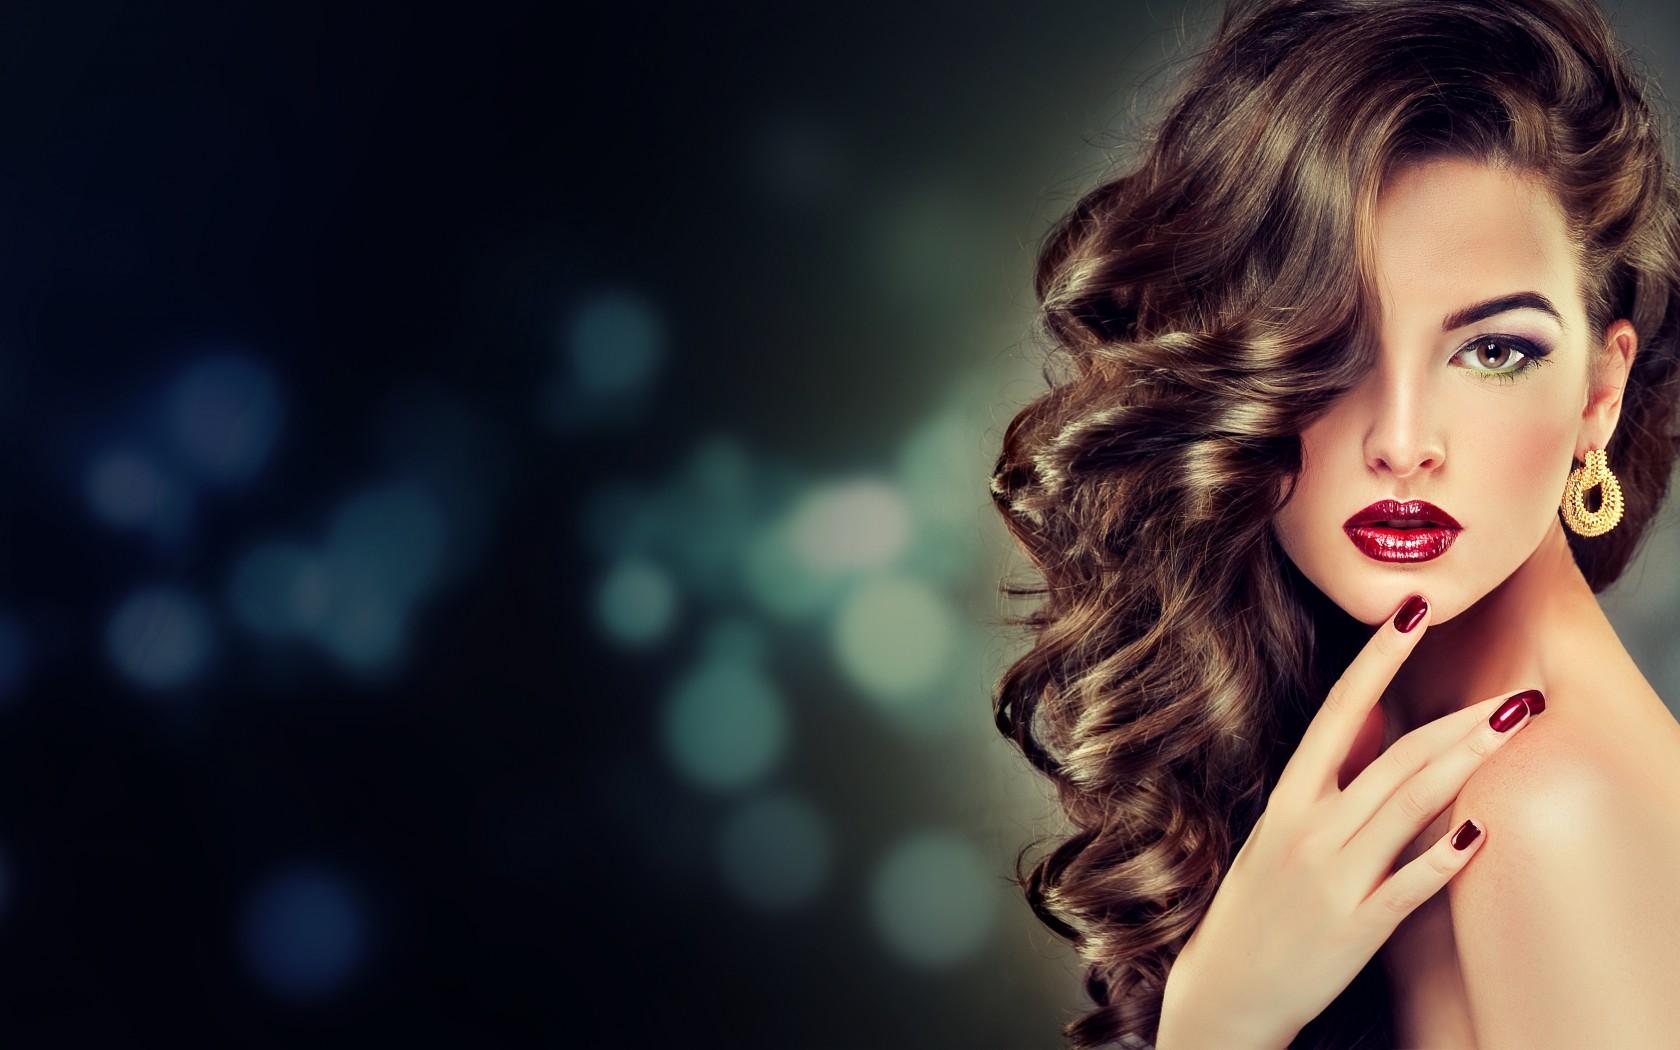 Красивое прически и макияжа